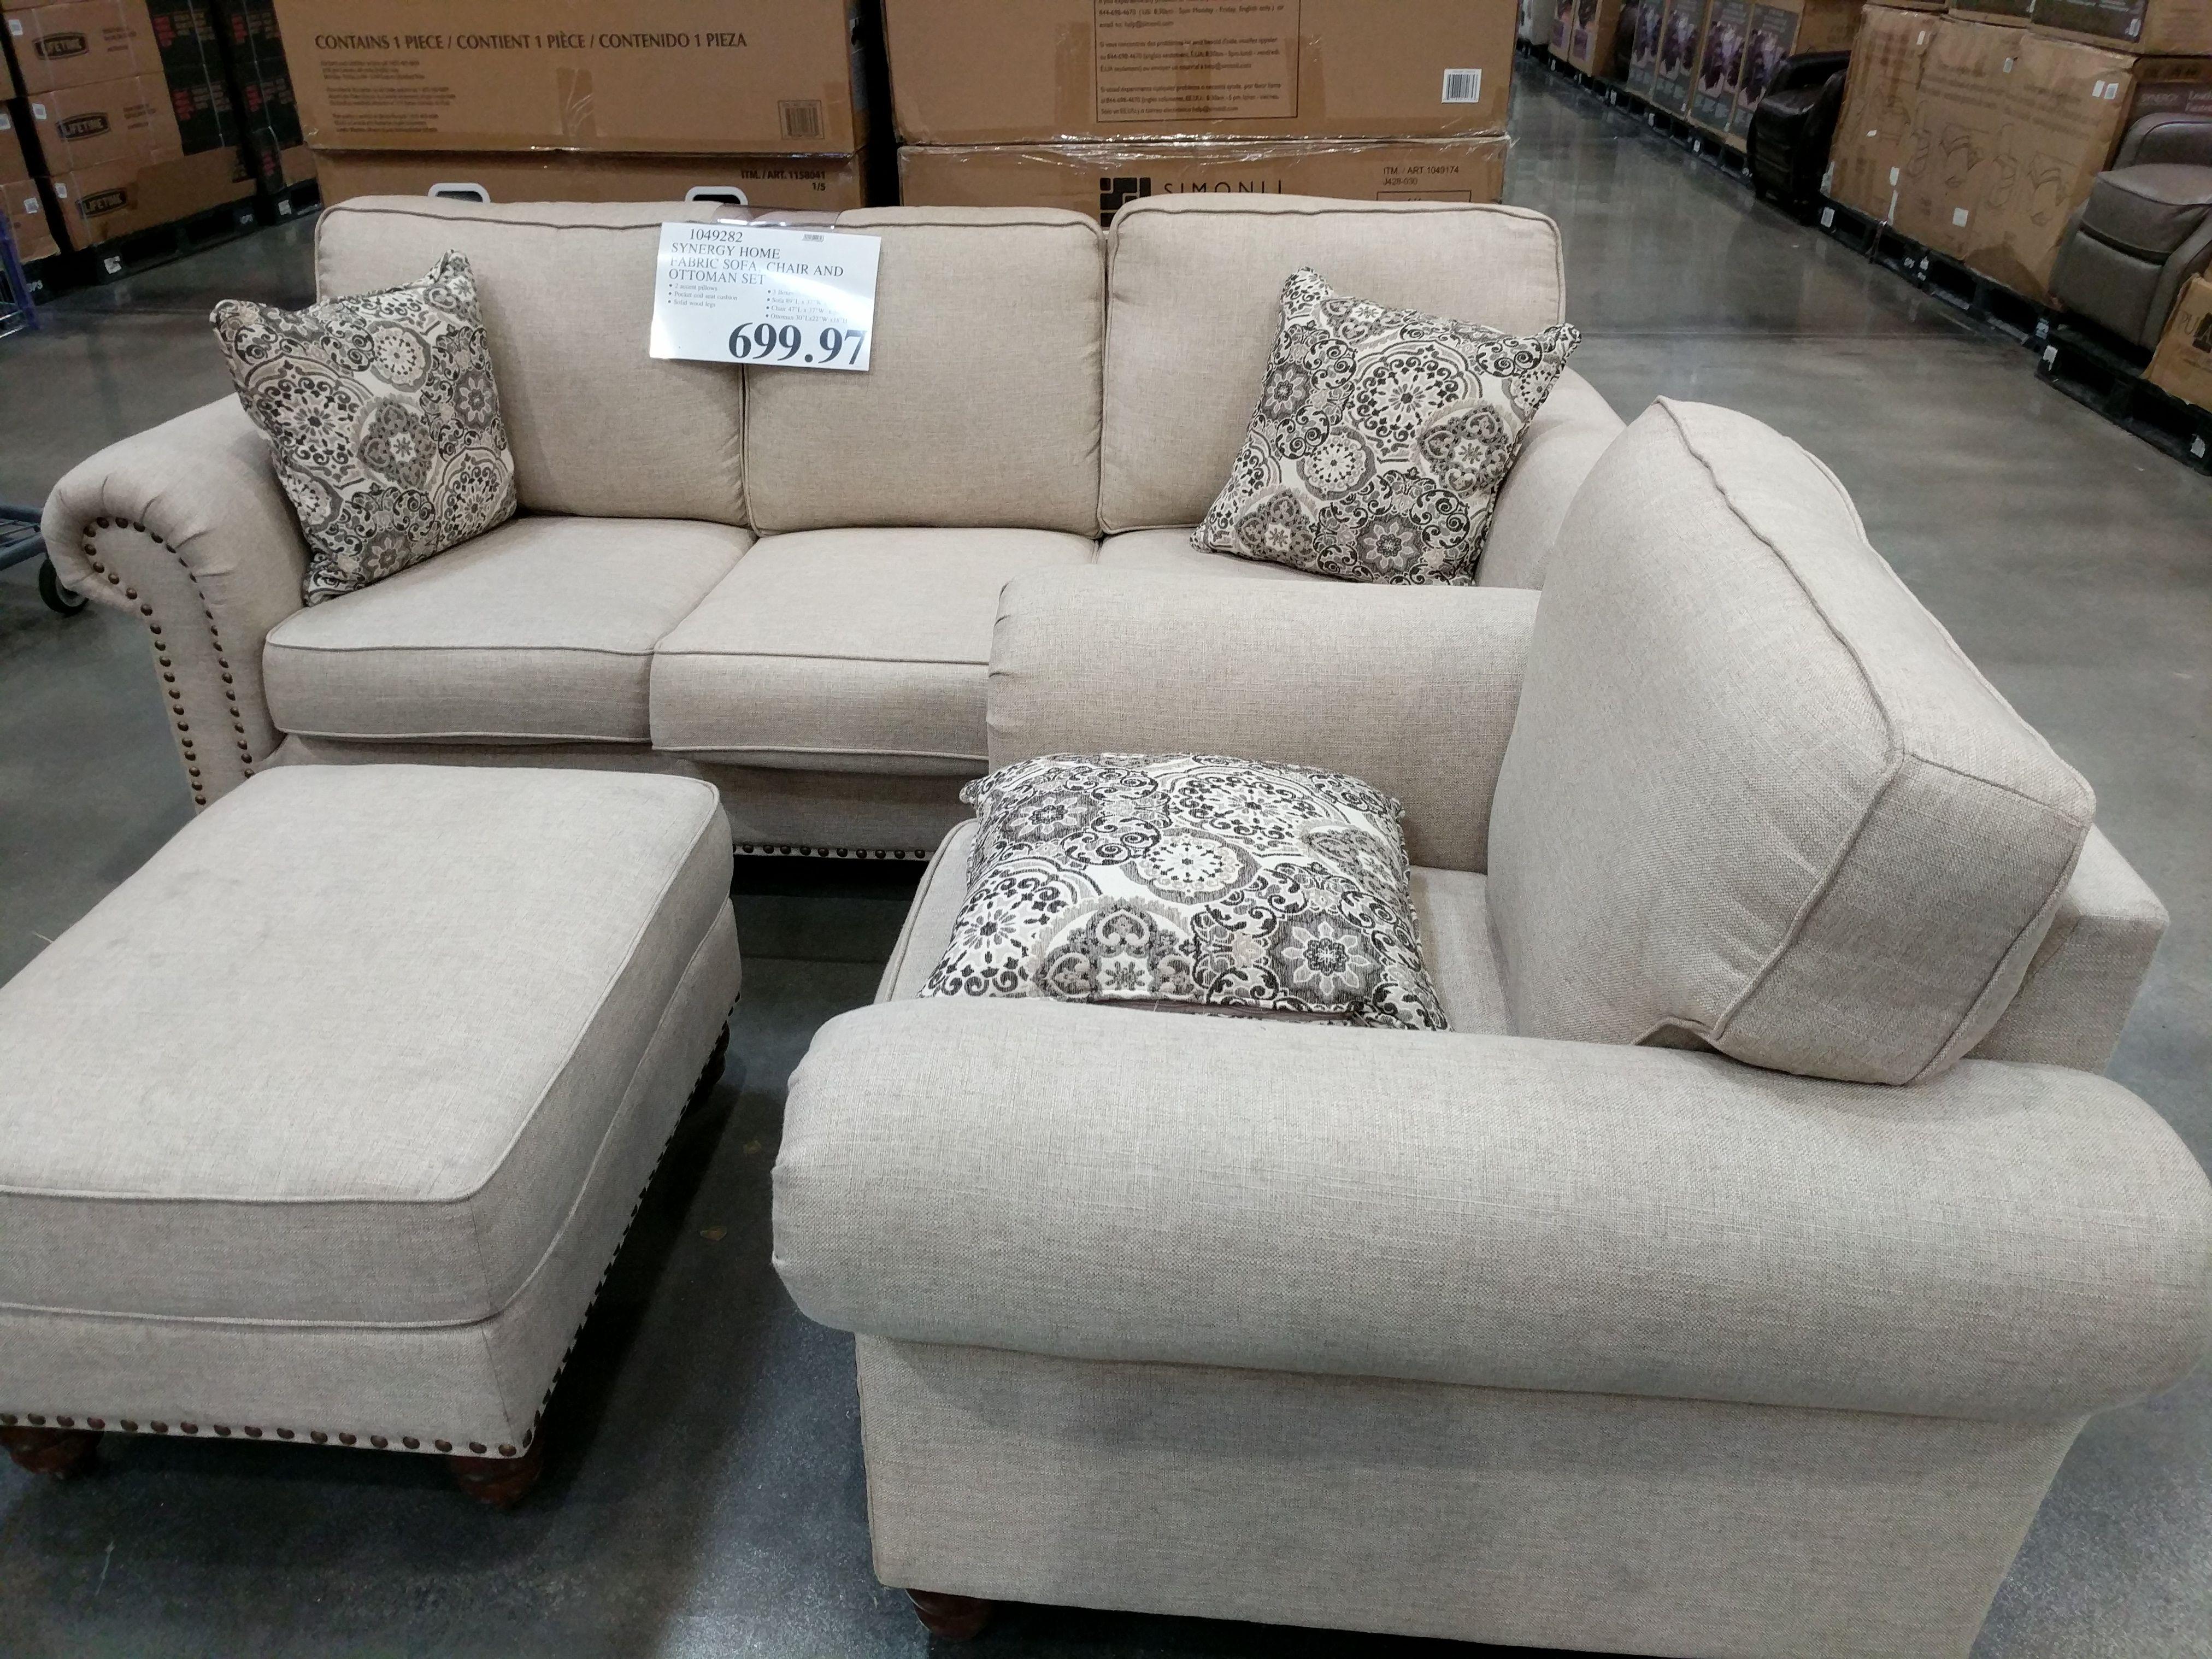 Synergy Home Fabric Sofa Chair And Ottoman Set In 2020 Chair And Ottoman Set Fabric Sofa Chair And Ottoman